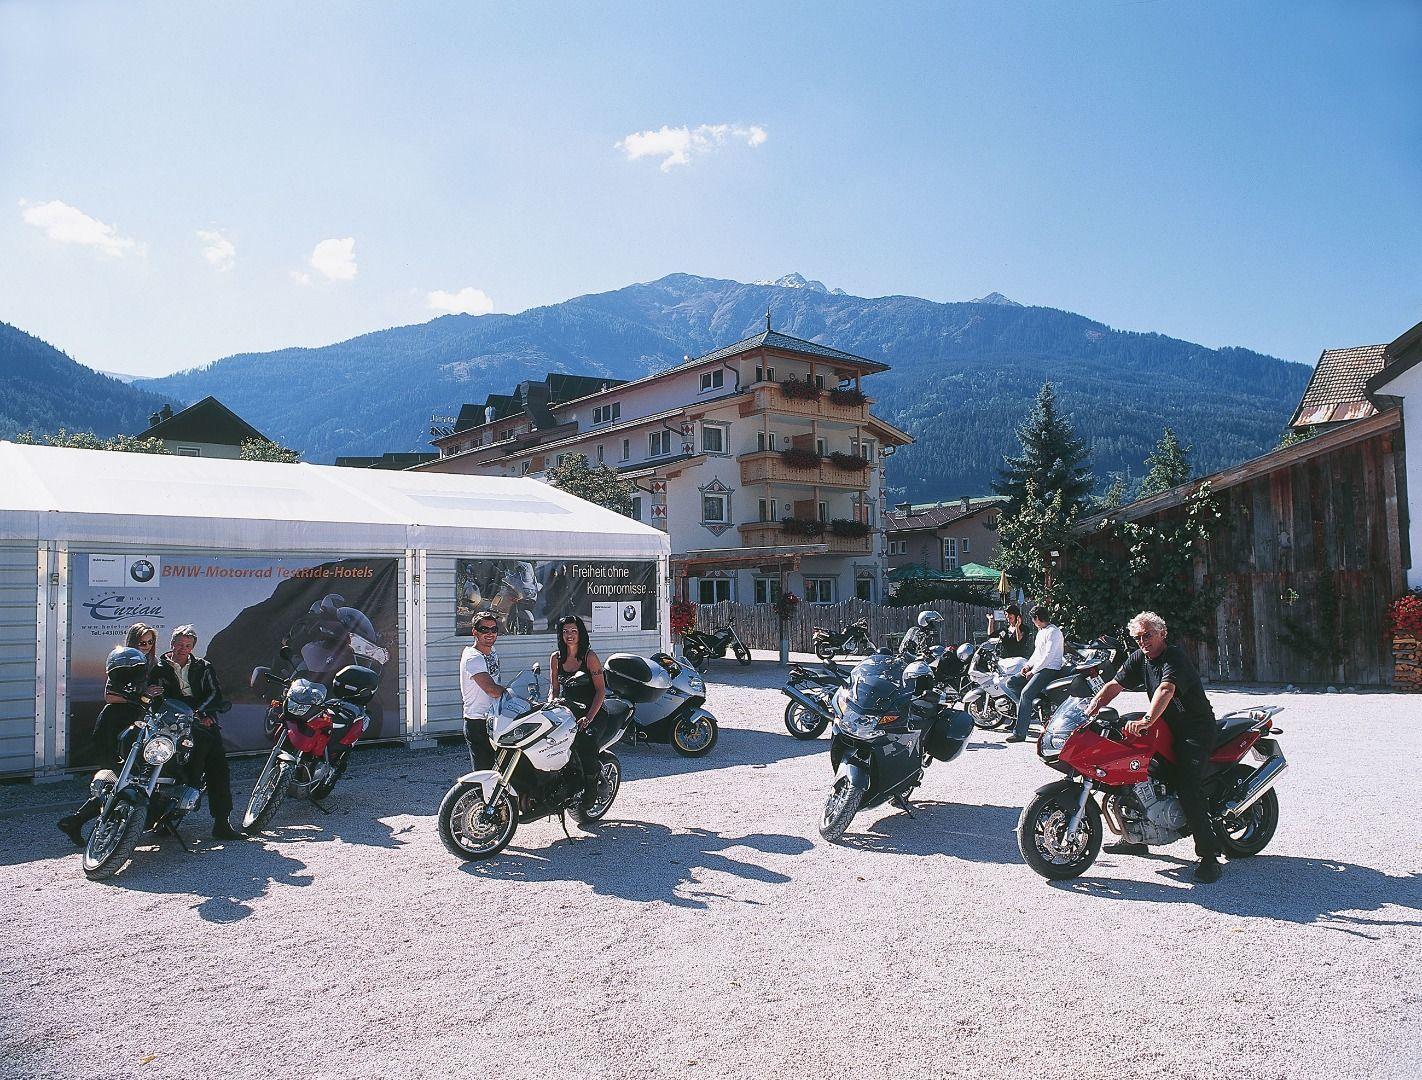 Hotel Enzian - Motorrad-Verleih